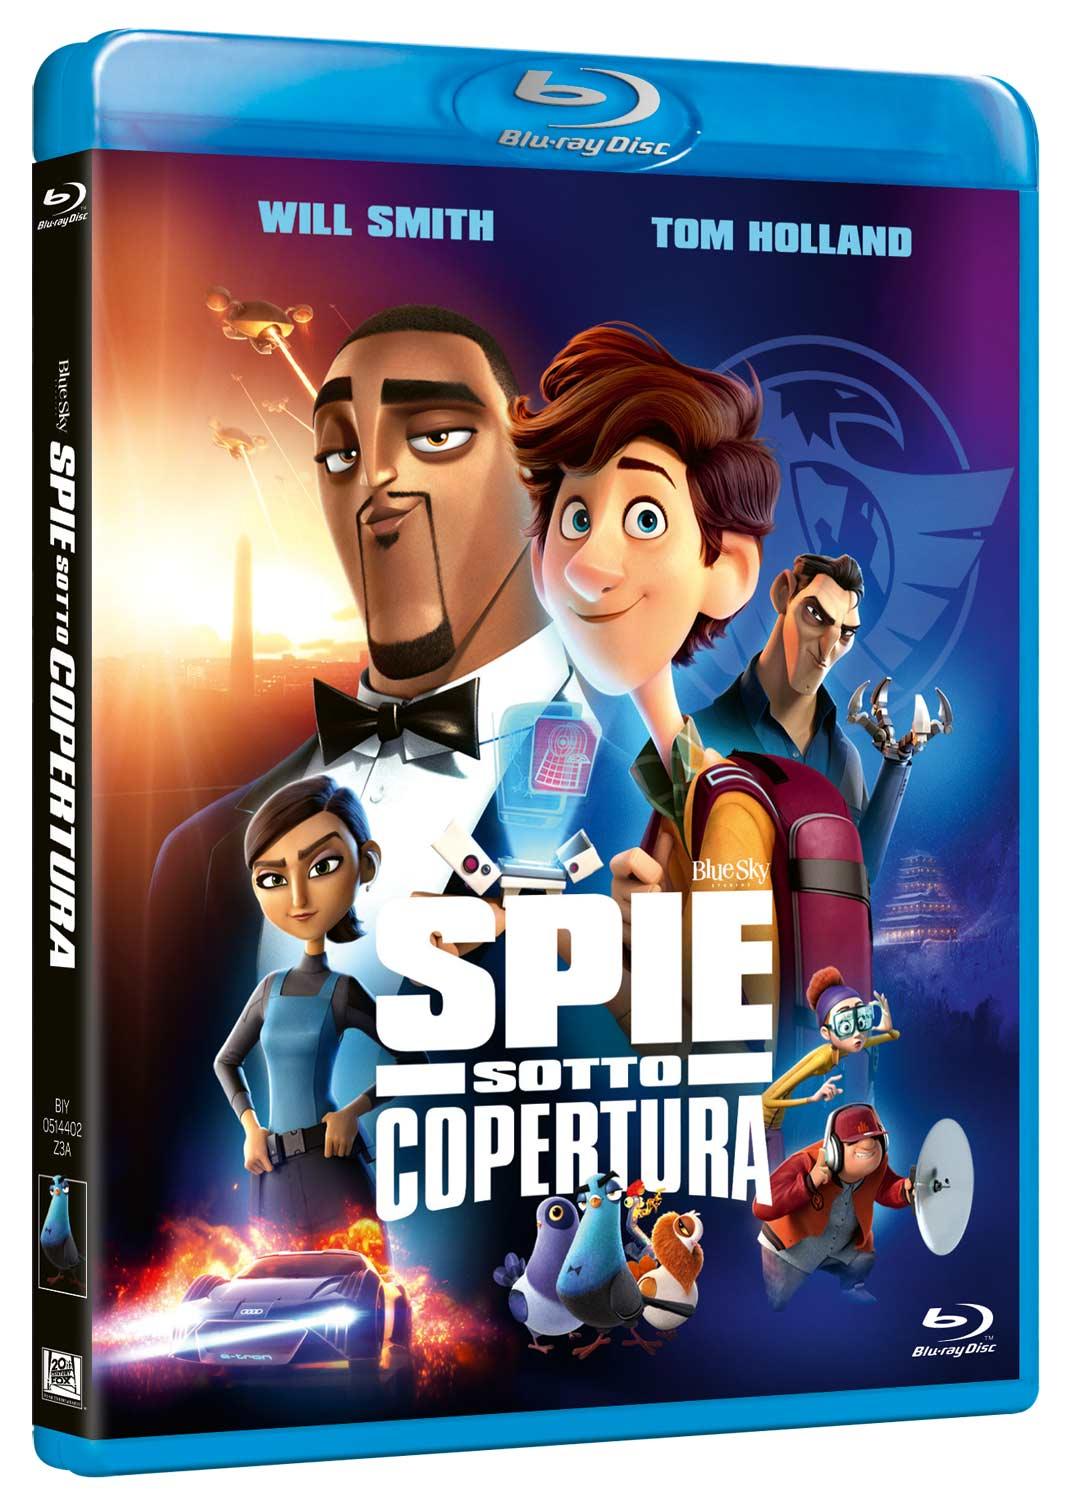 SPIE SOTTO COPERTURA - BLU RAY (DVD)